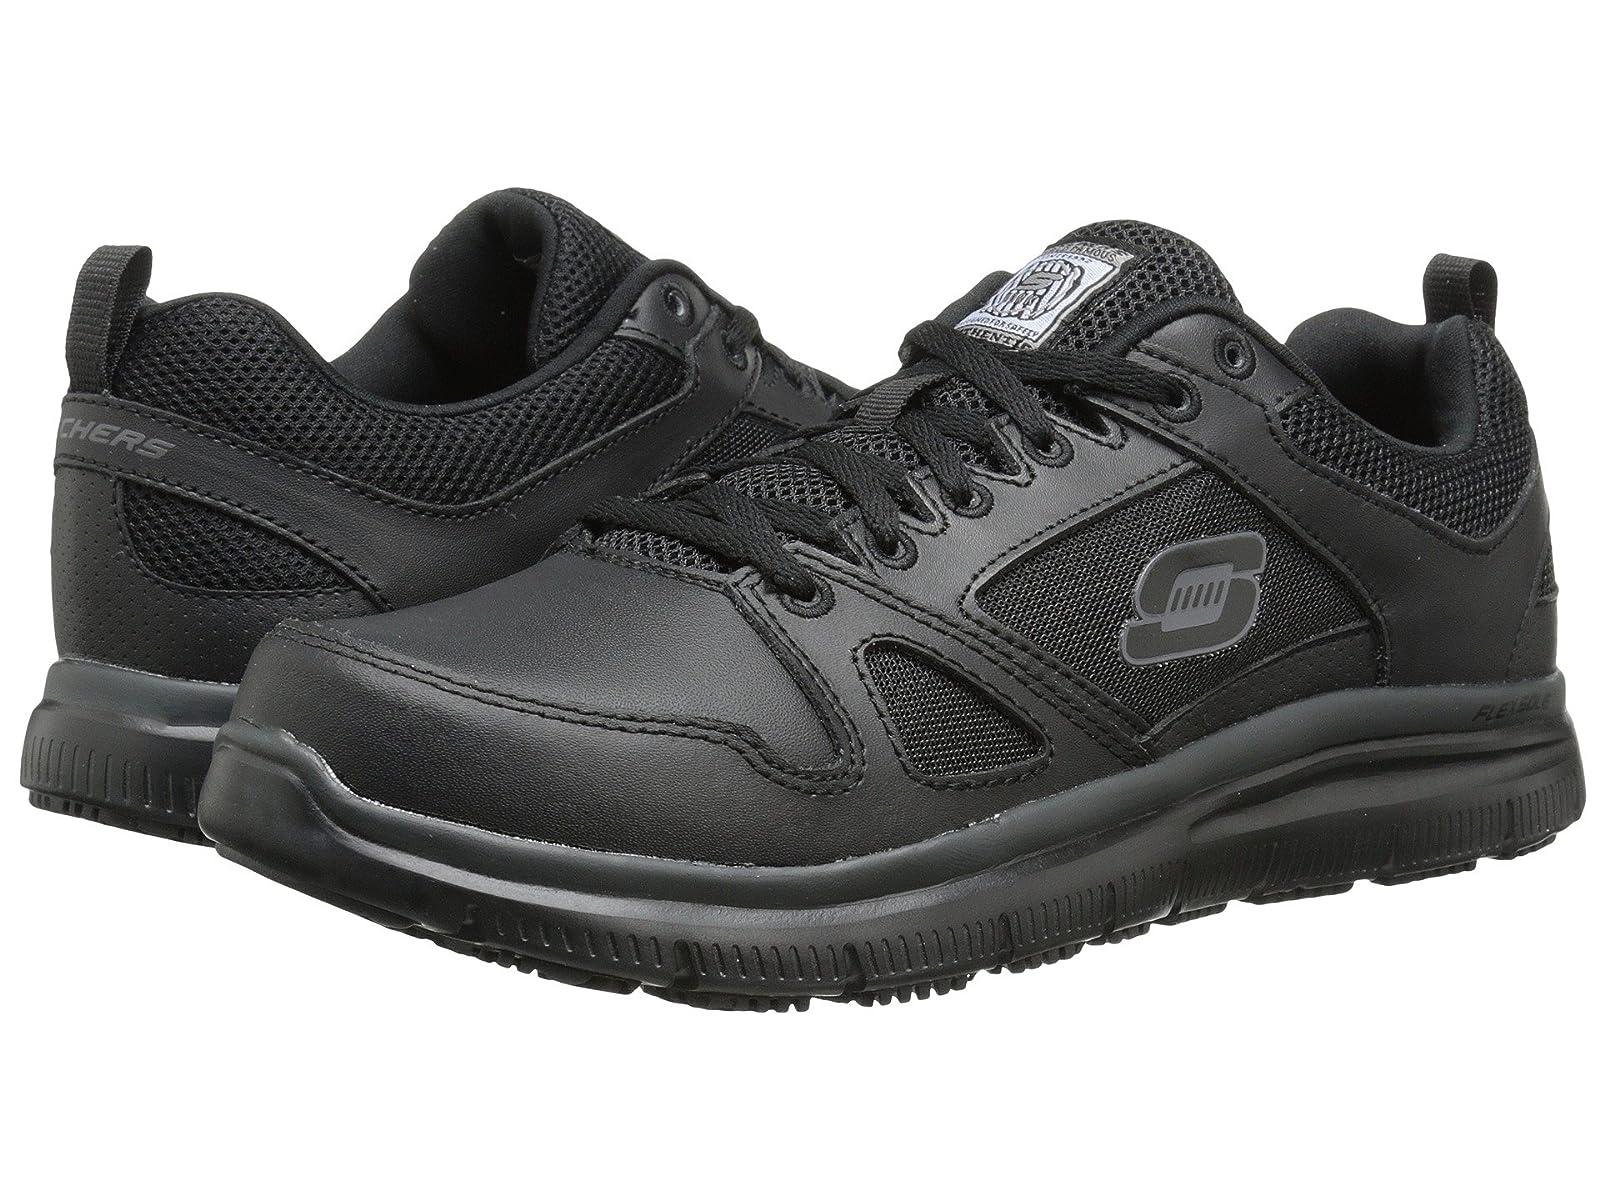 SKECHERS Work Flex - AdvantageAtmospheric grades have affordable shoes